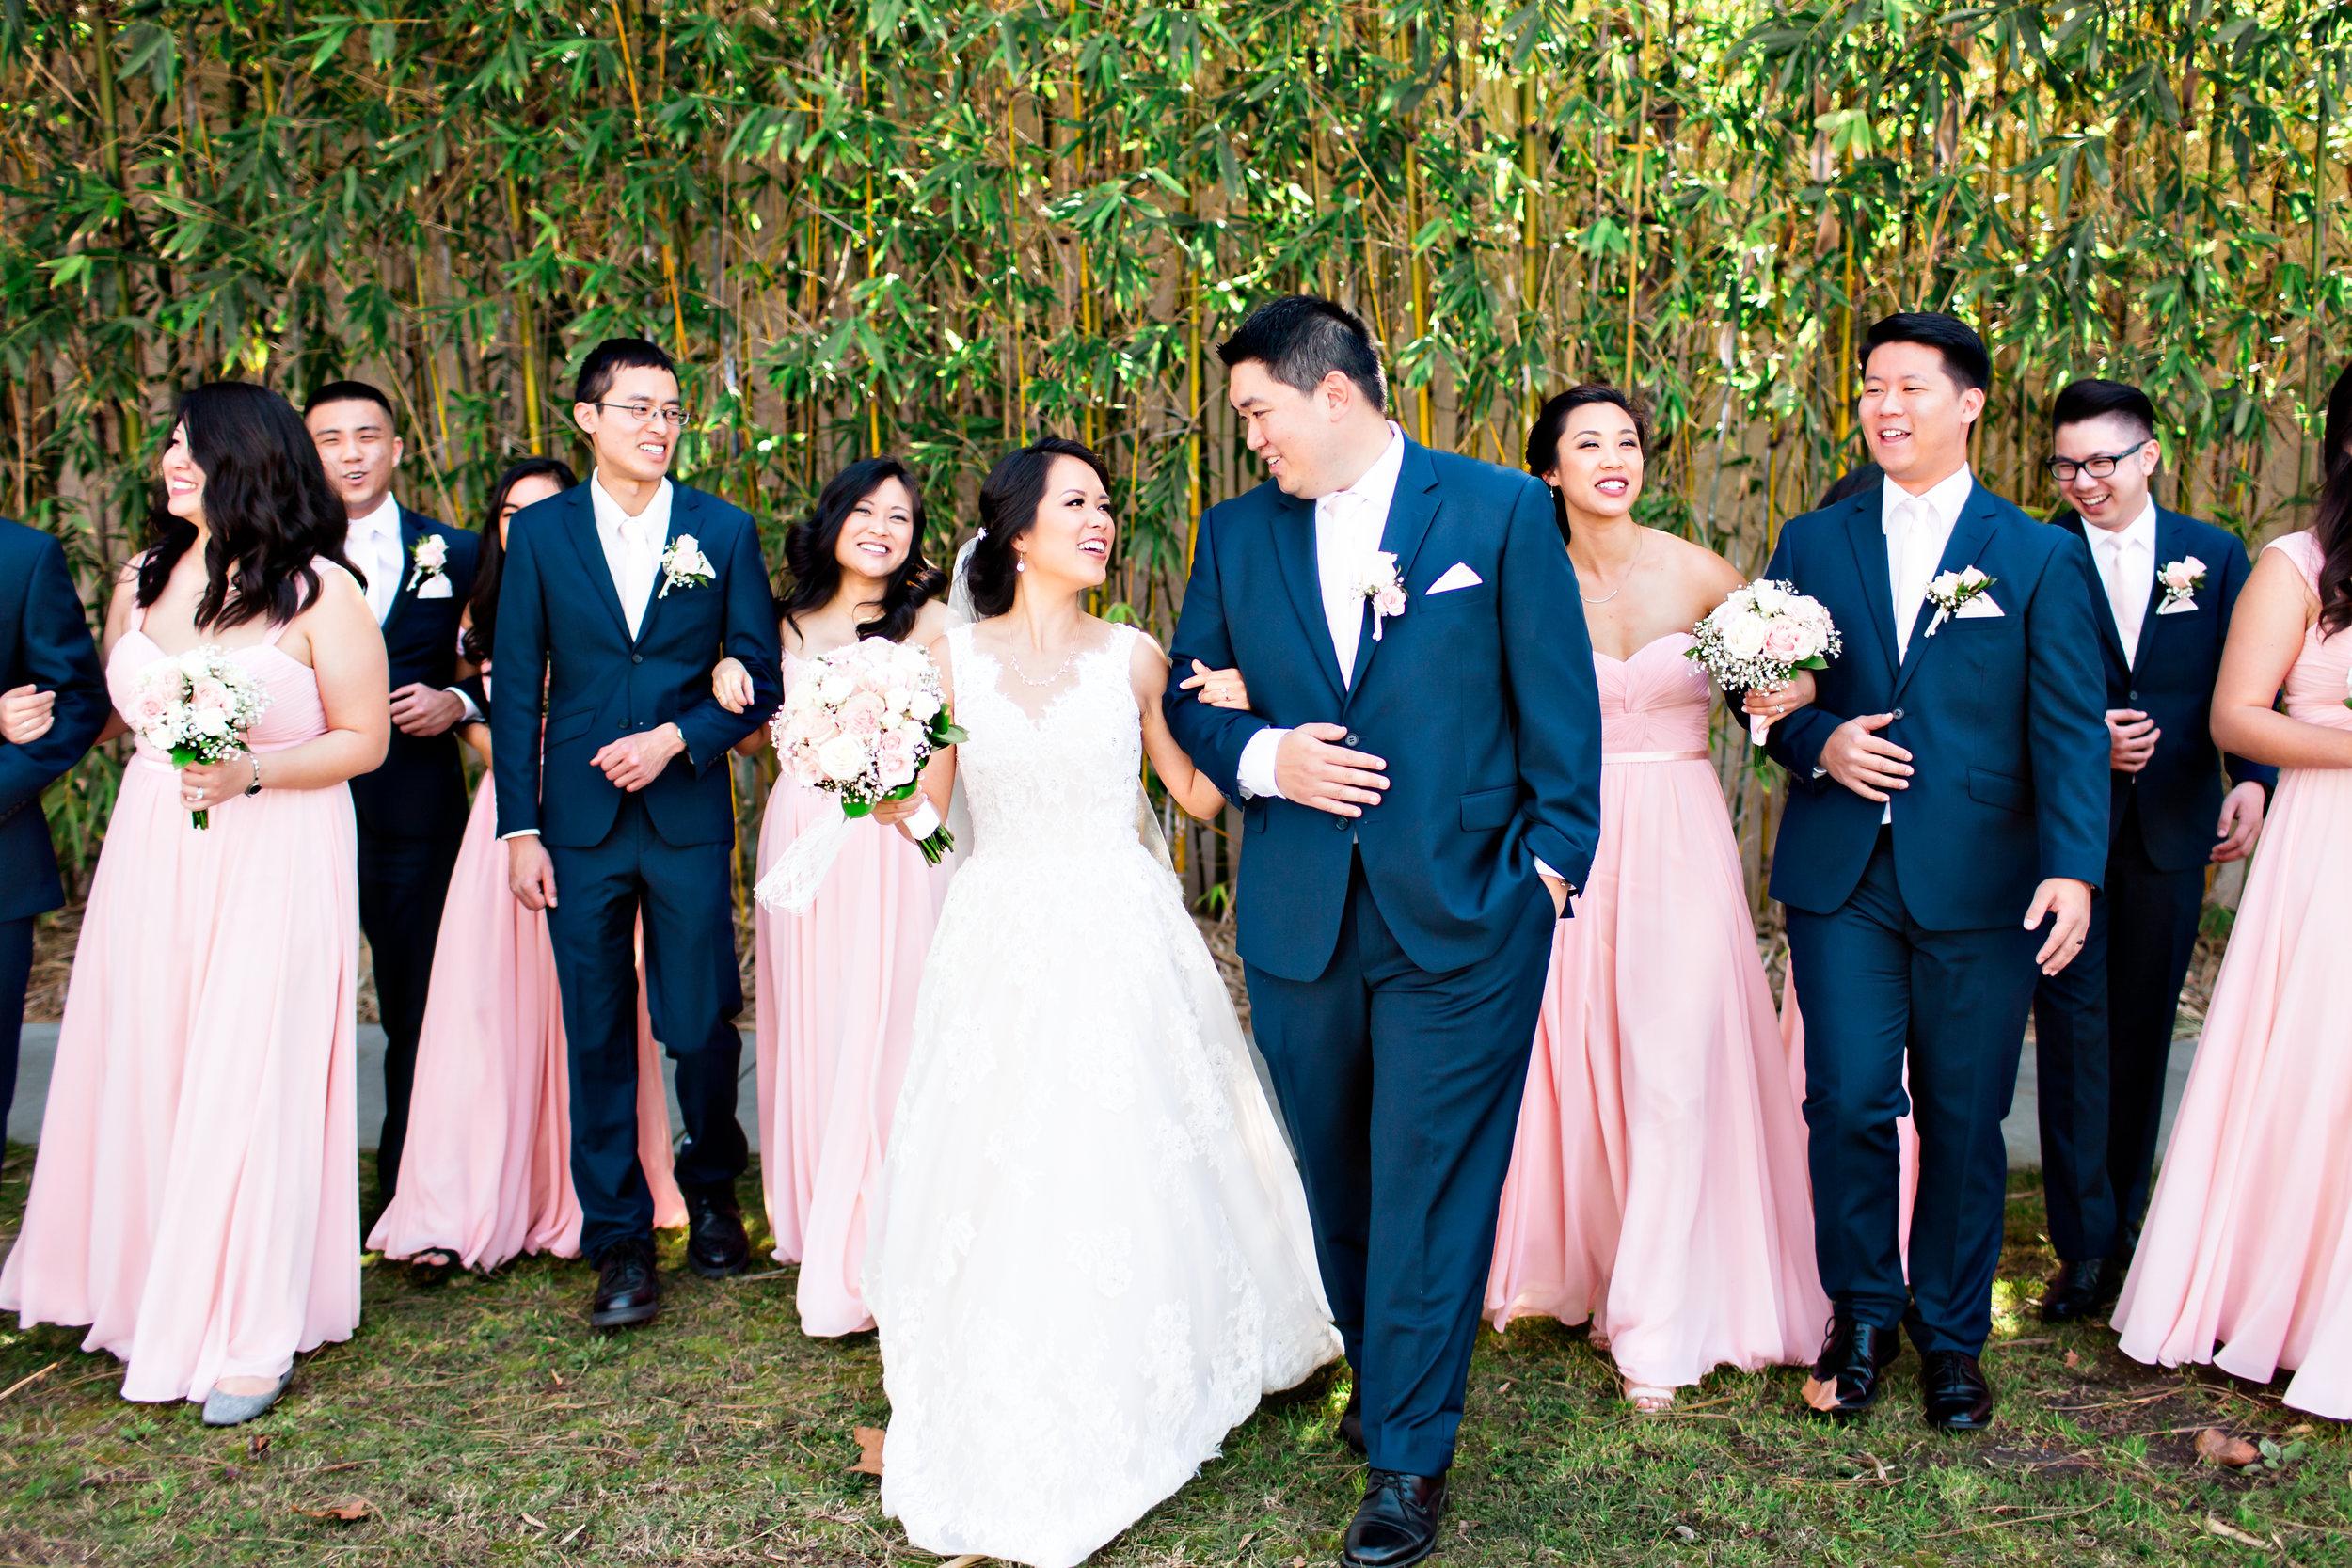 Knotts_Berry_Farm_Hotel_Wedding-320.jpg